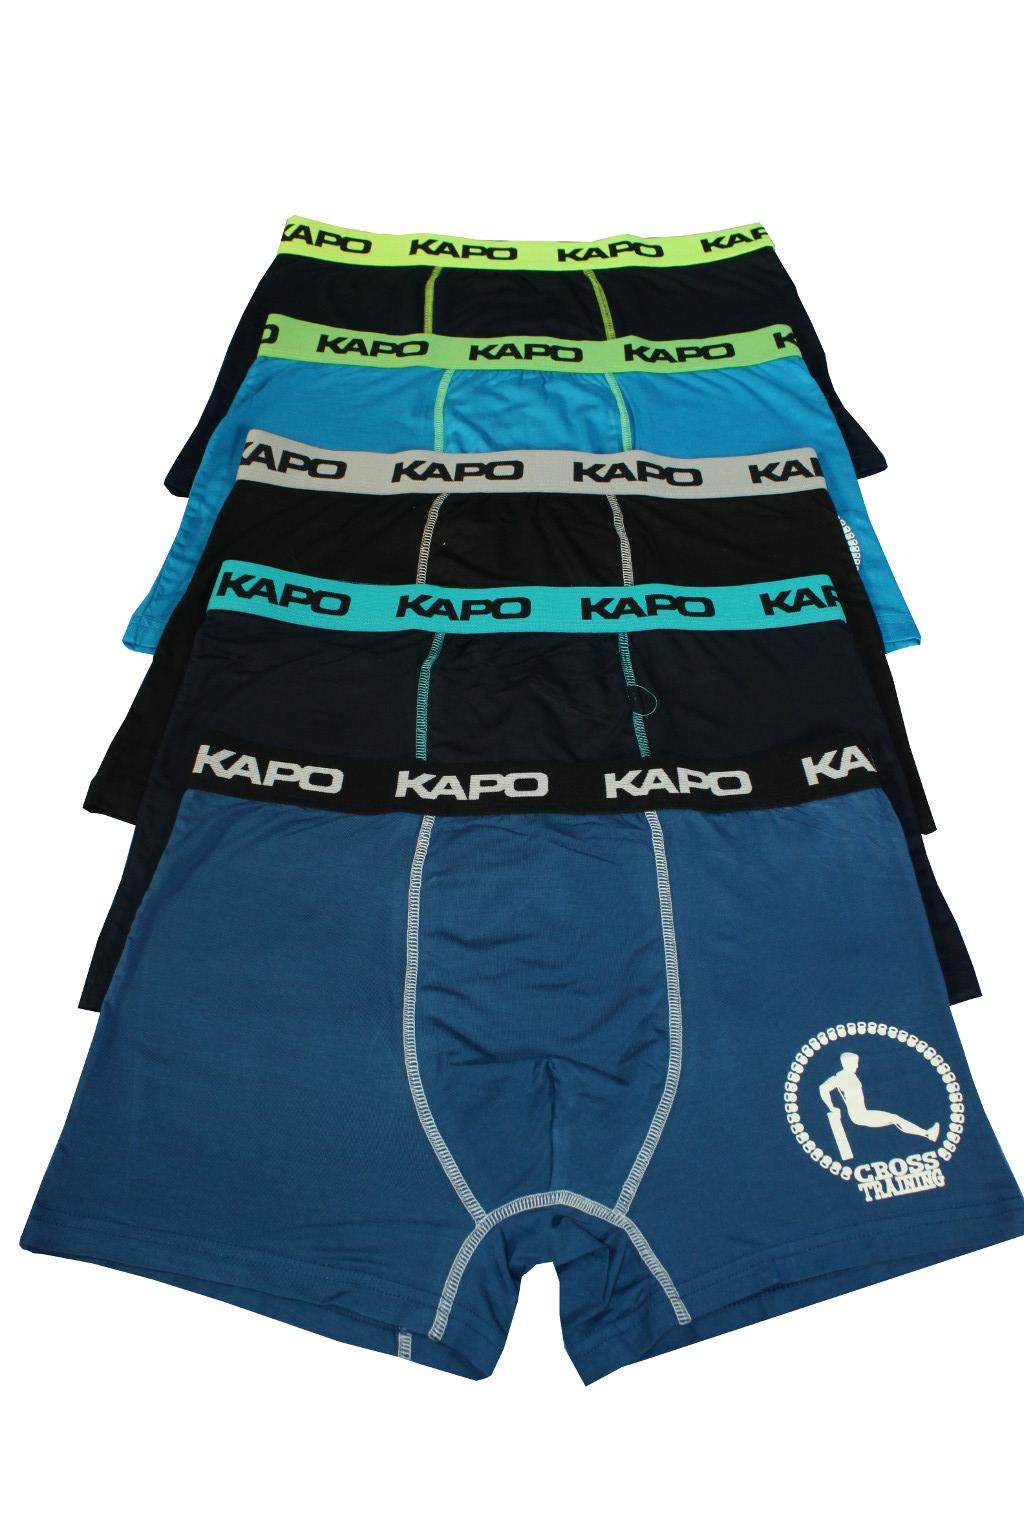 CrossTraining KAPO bambus boxerky 5ks XXL MIX